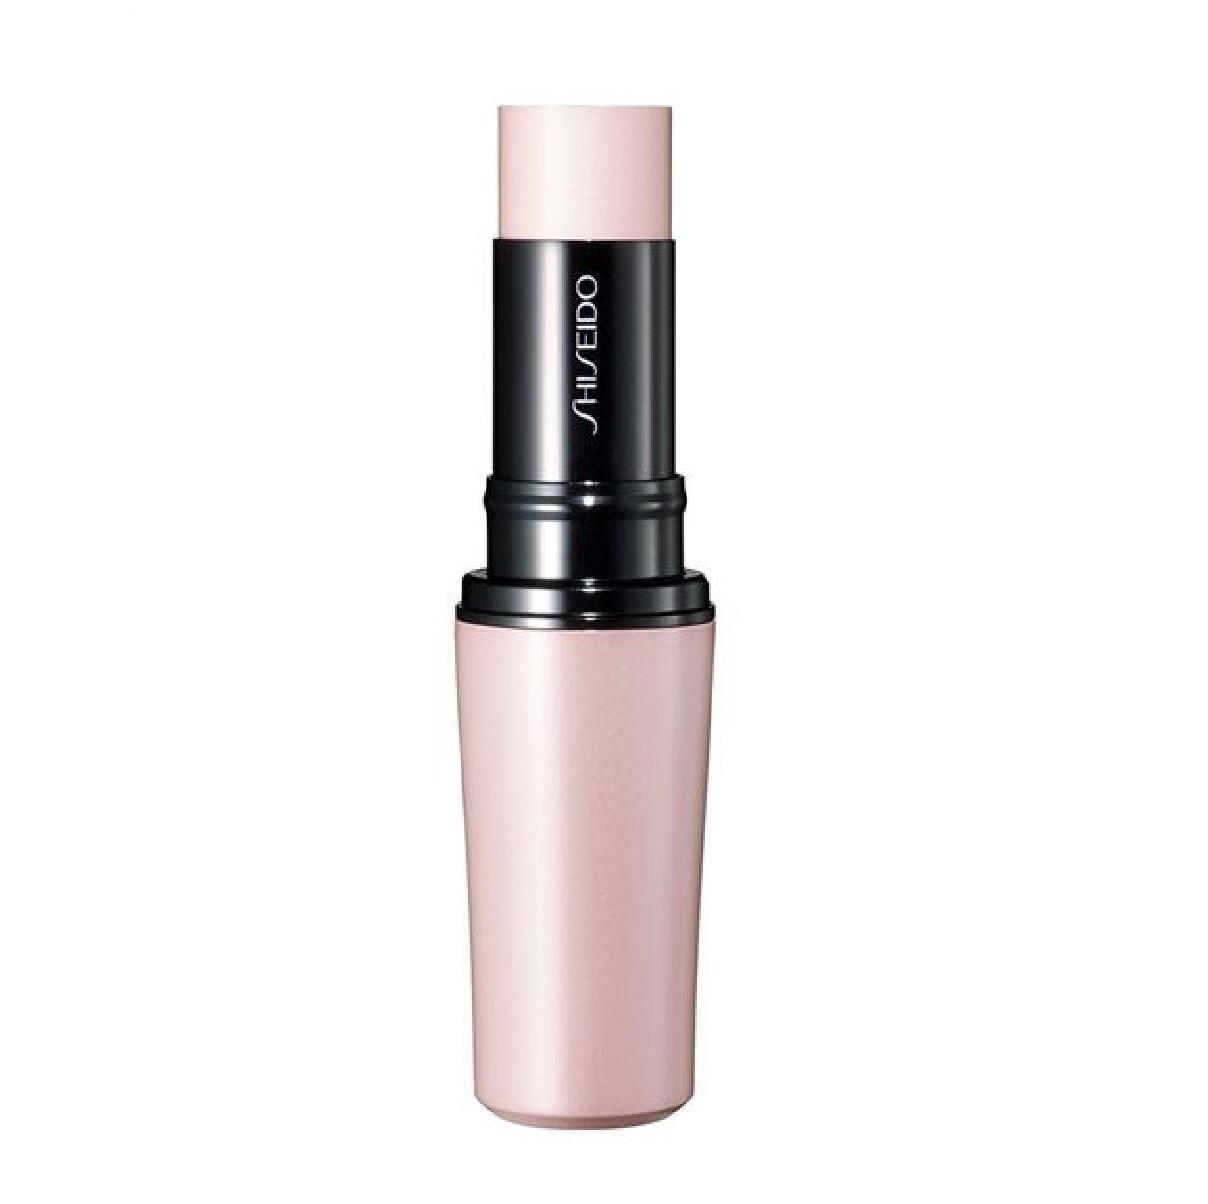 phan-ma-shiseido-accentuating-color-stick-review-thanh-phan-gia-cong-dung